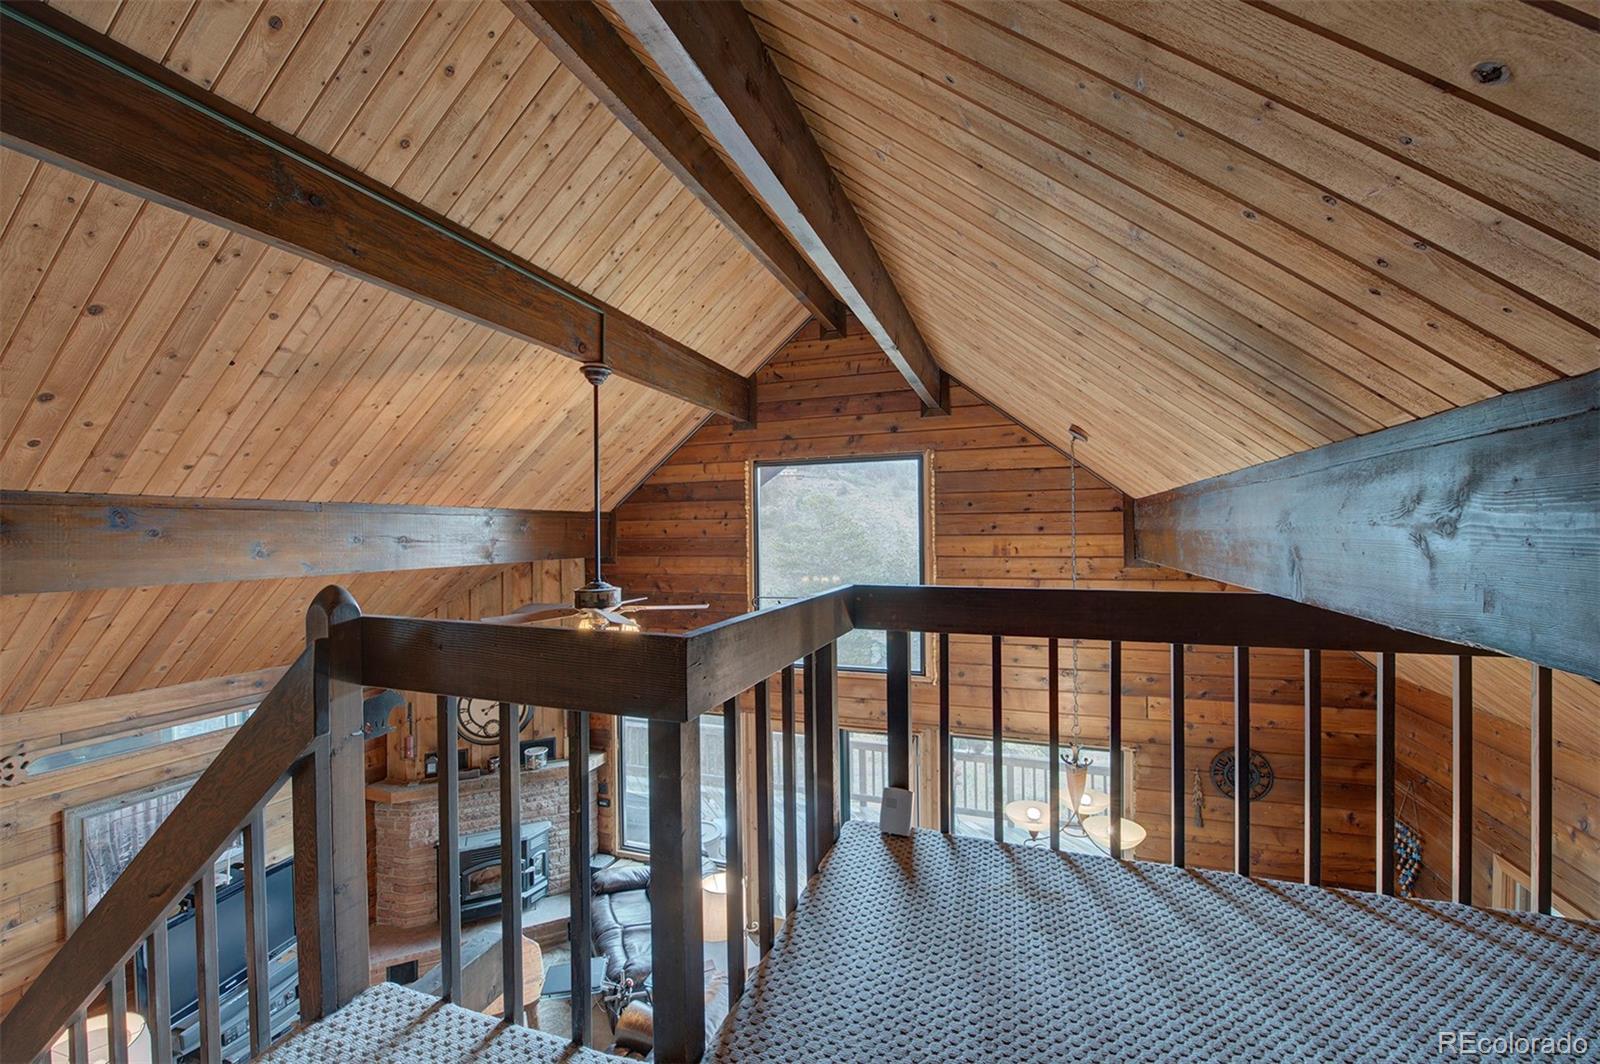 MLS# 6922377 - 17 - 12123 Geronimo Trail, Conifer, CO 80433